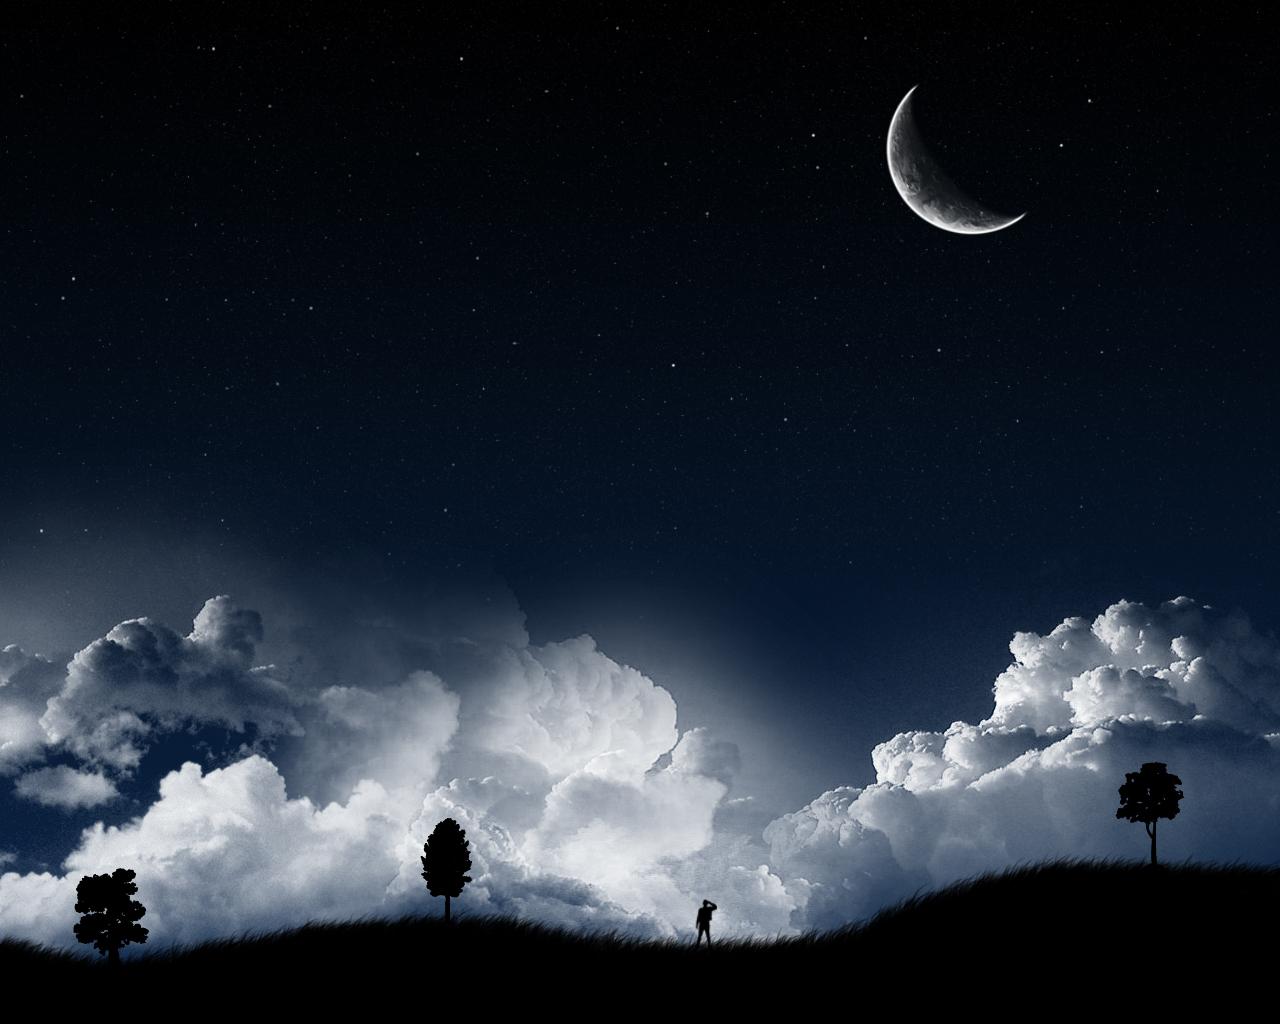 Beautiful Night Sky wallpaperWallpaper Background Wallpaper Background 1280x1024